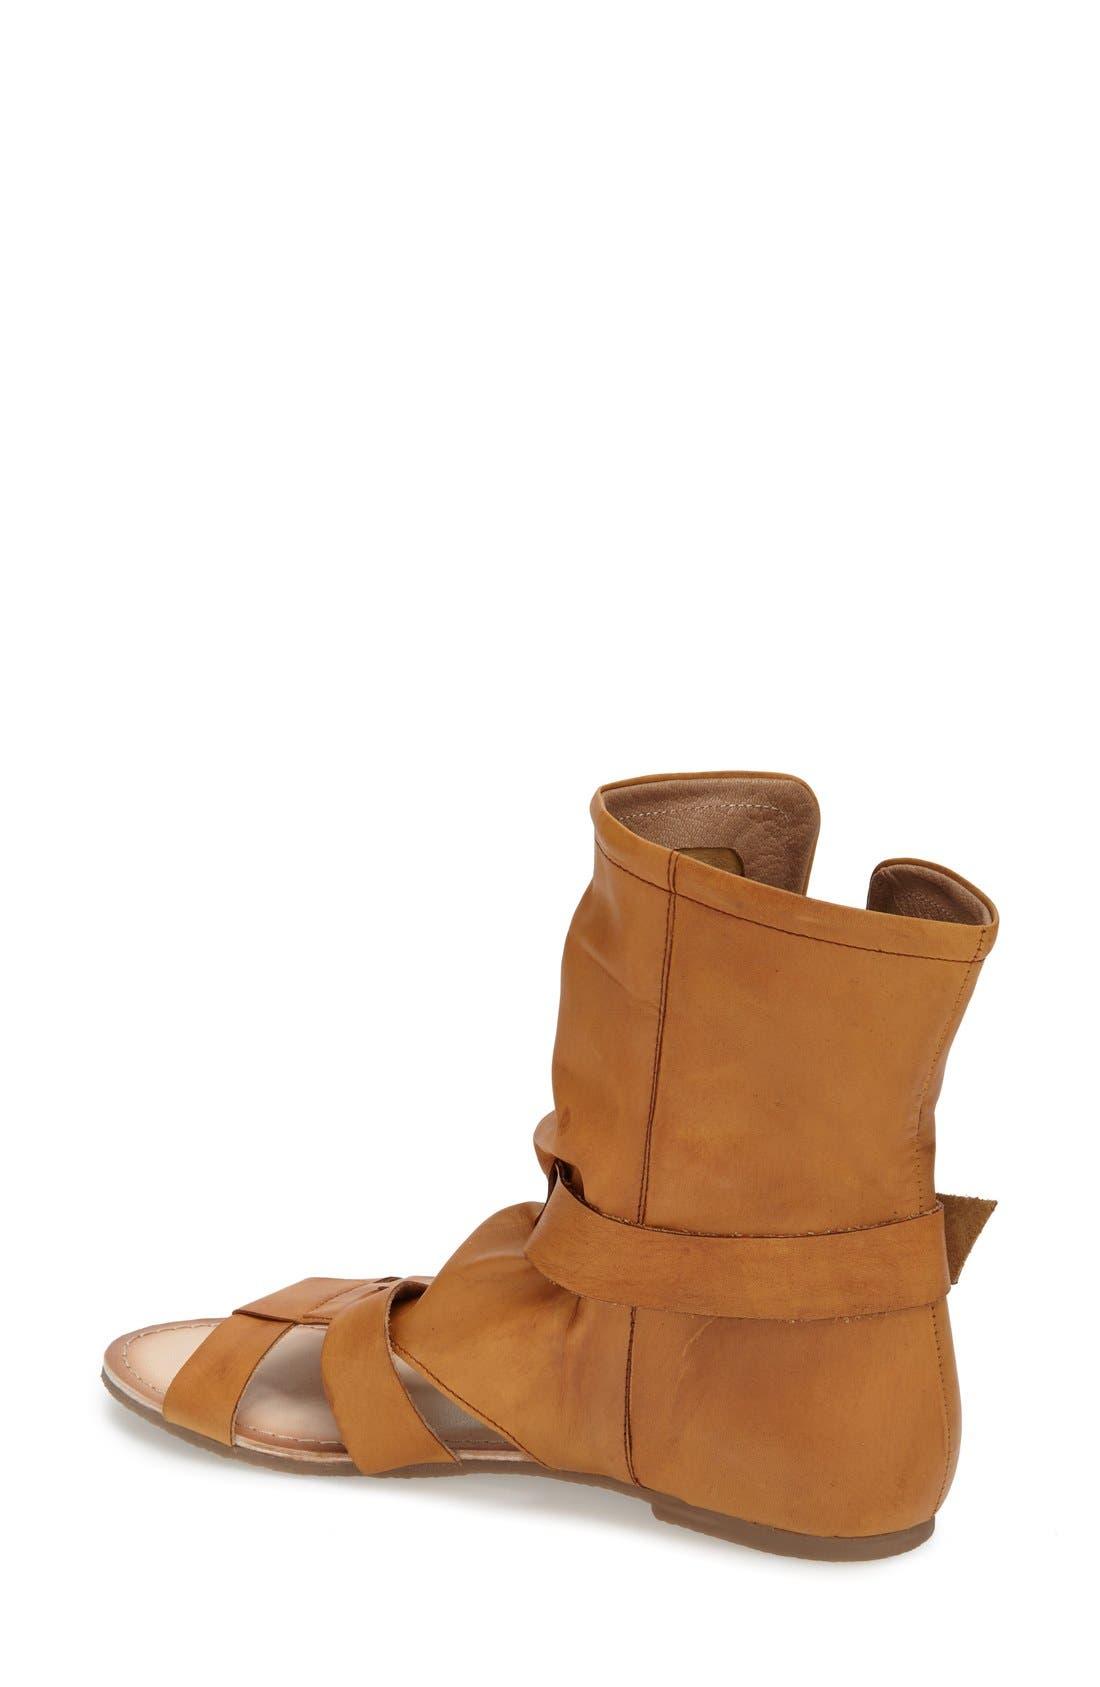 Alternate Image 2  - Matisse Gladiator Sandal (Women)